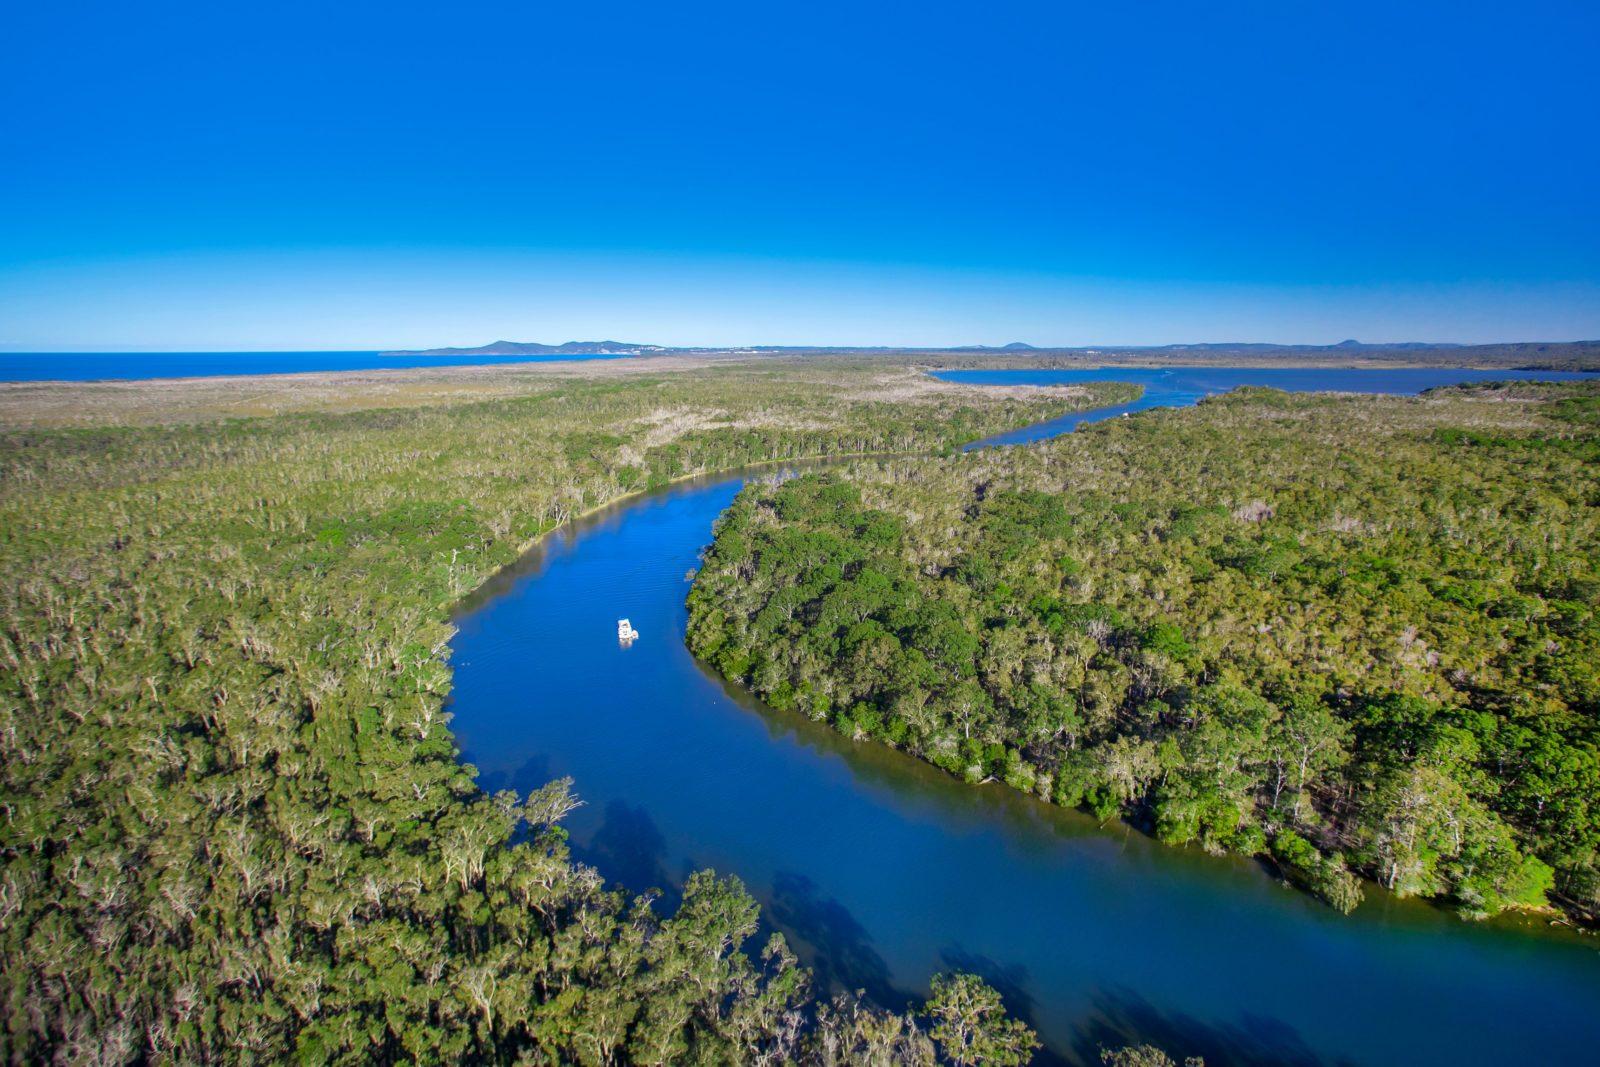 Noosa Everglades, Noosa, Sunshine Coast